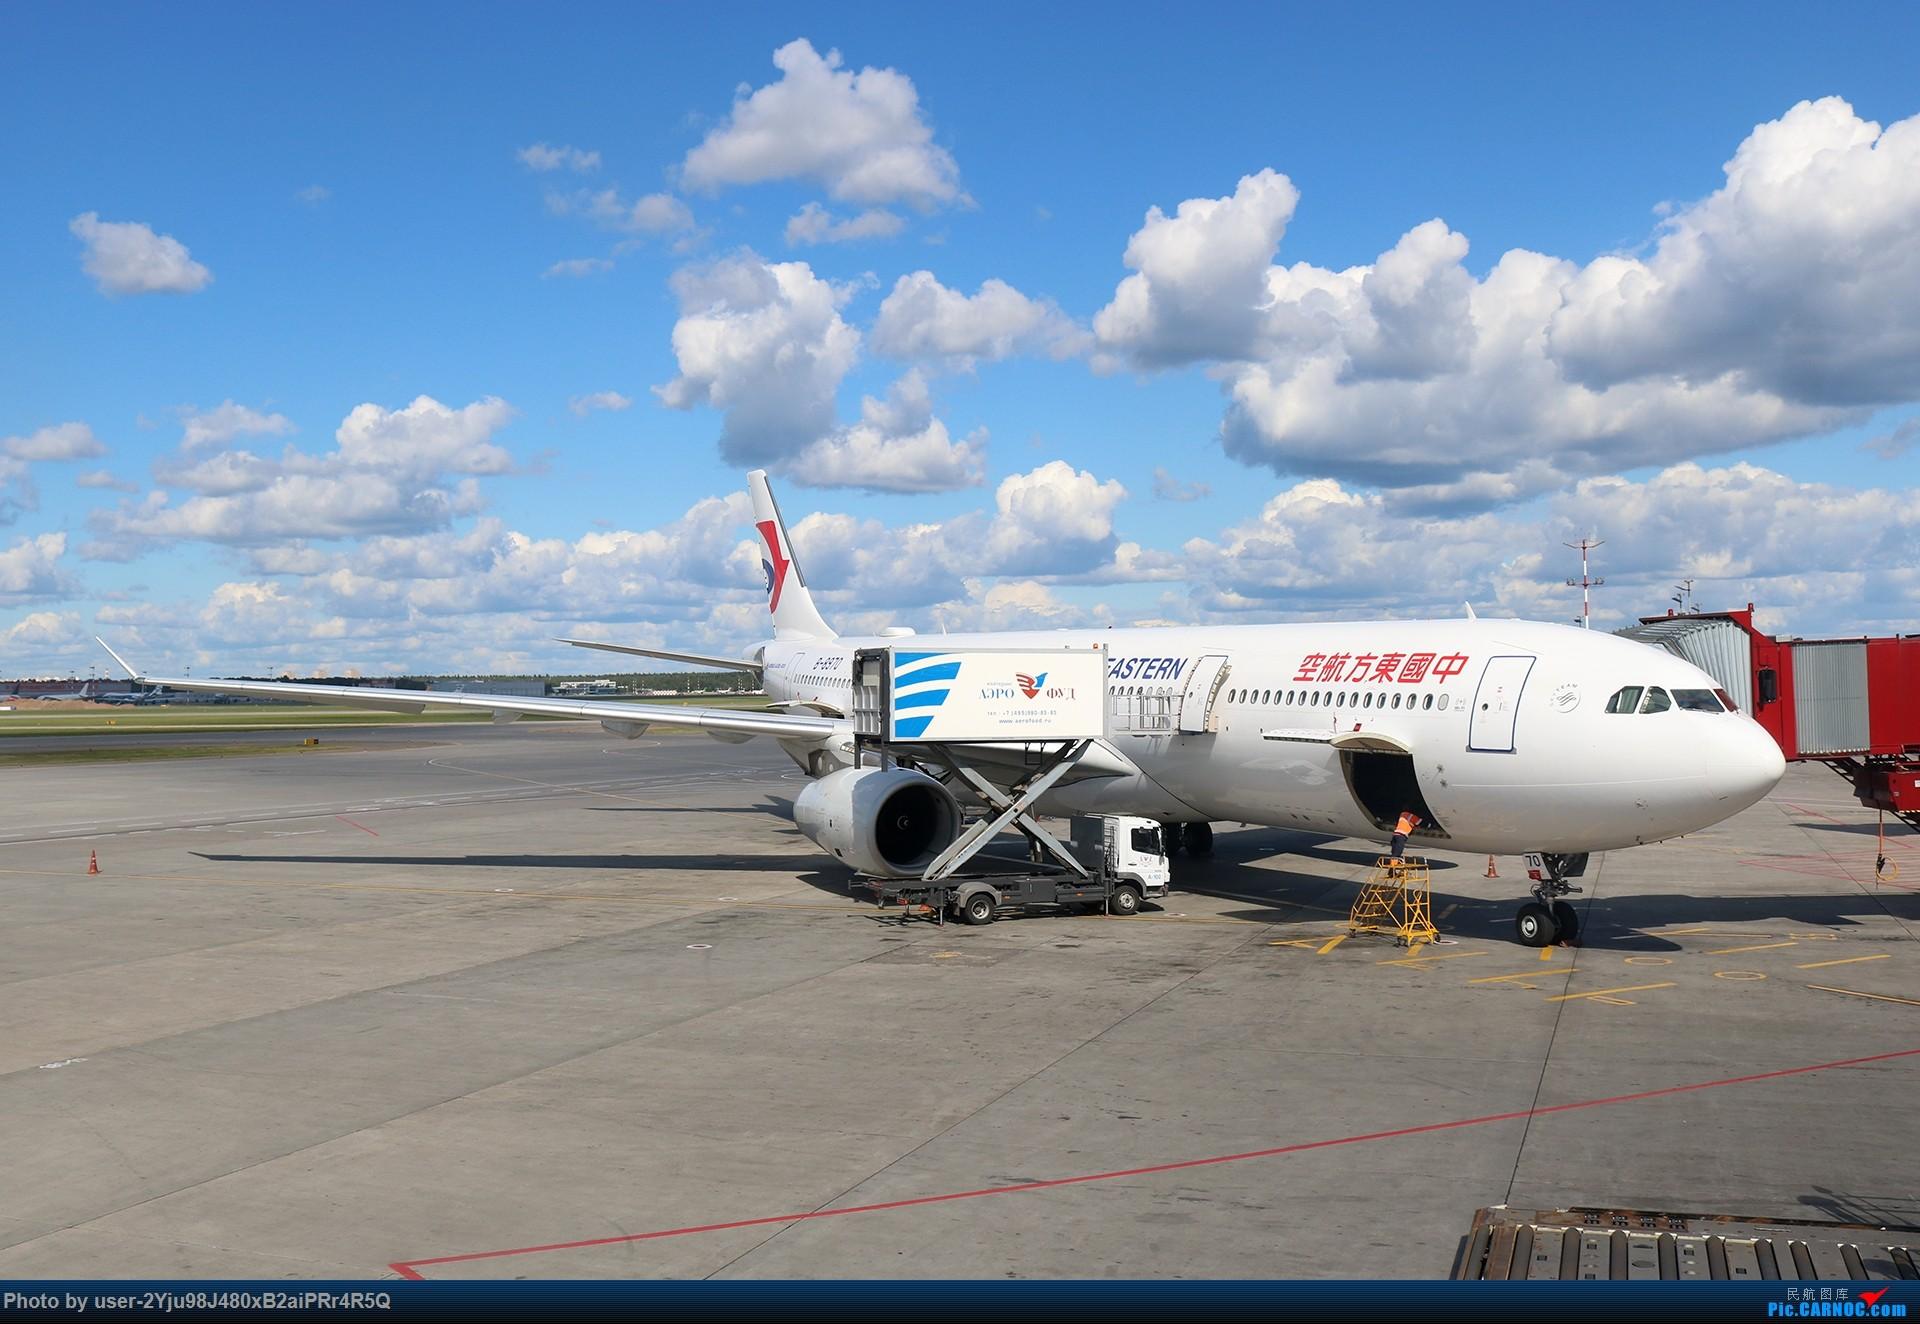 Re:[原创]LIULIU|一天两种机型三个国家四段航线五座城市的回家之路|西伯利亚上空的星光 AIRBUS A330-343 B-8970 俄罗斯谢诺梅杰沃机场